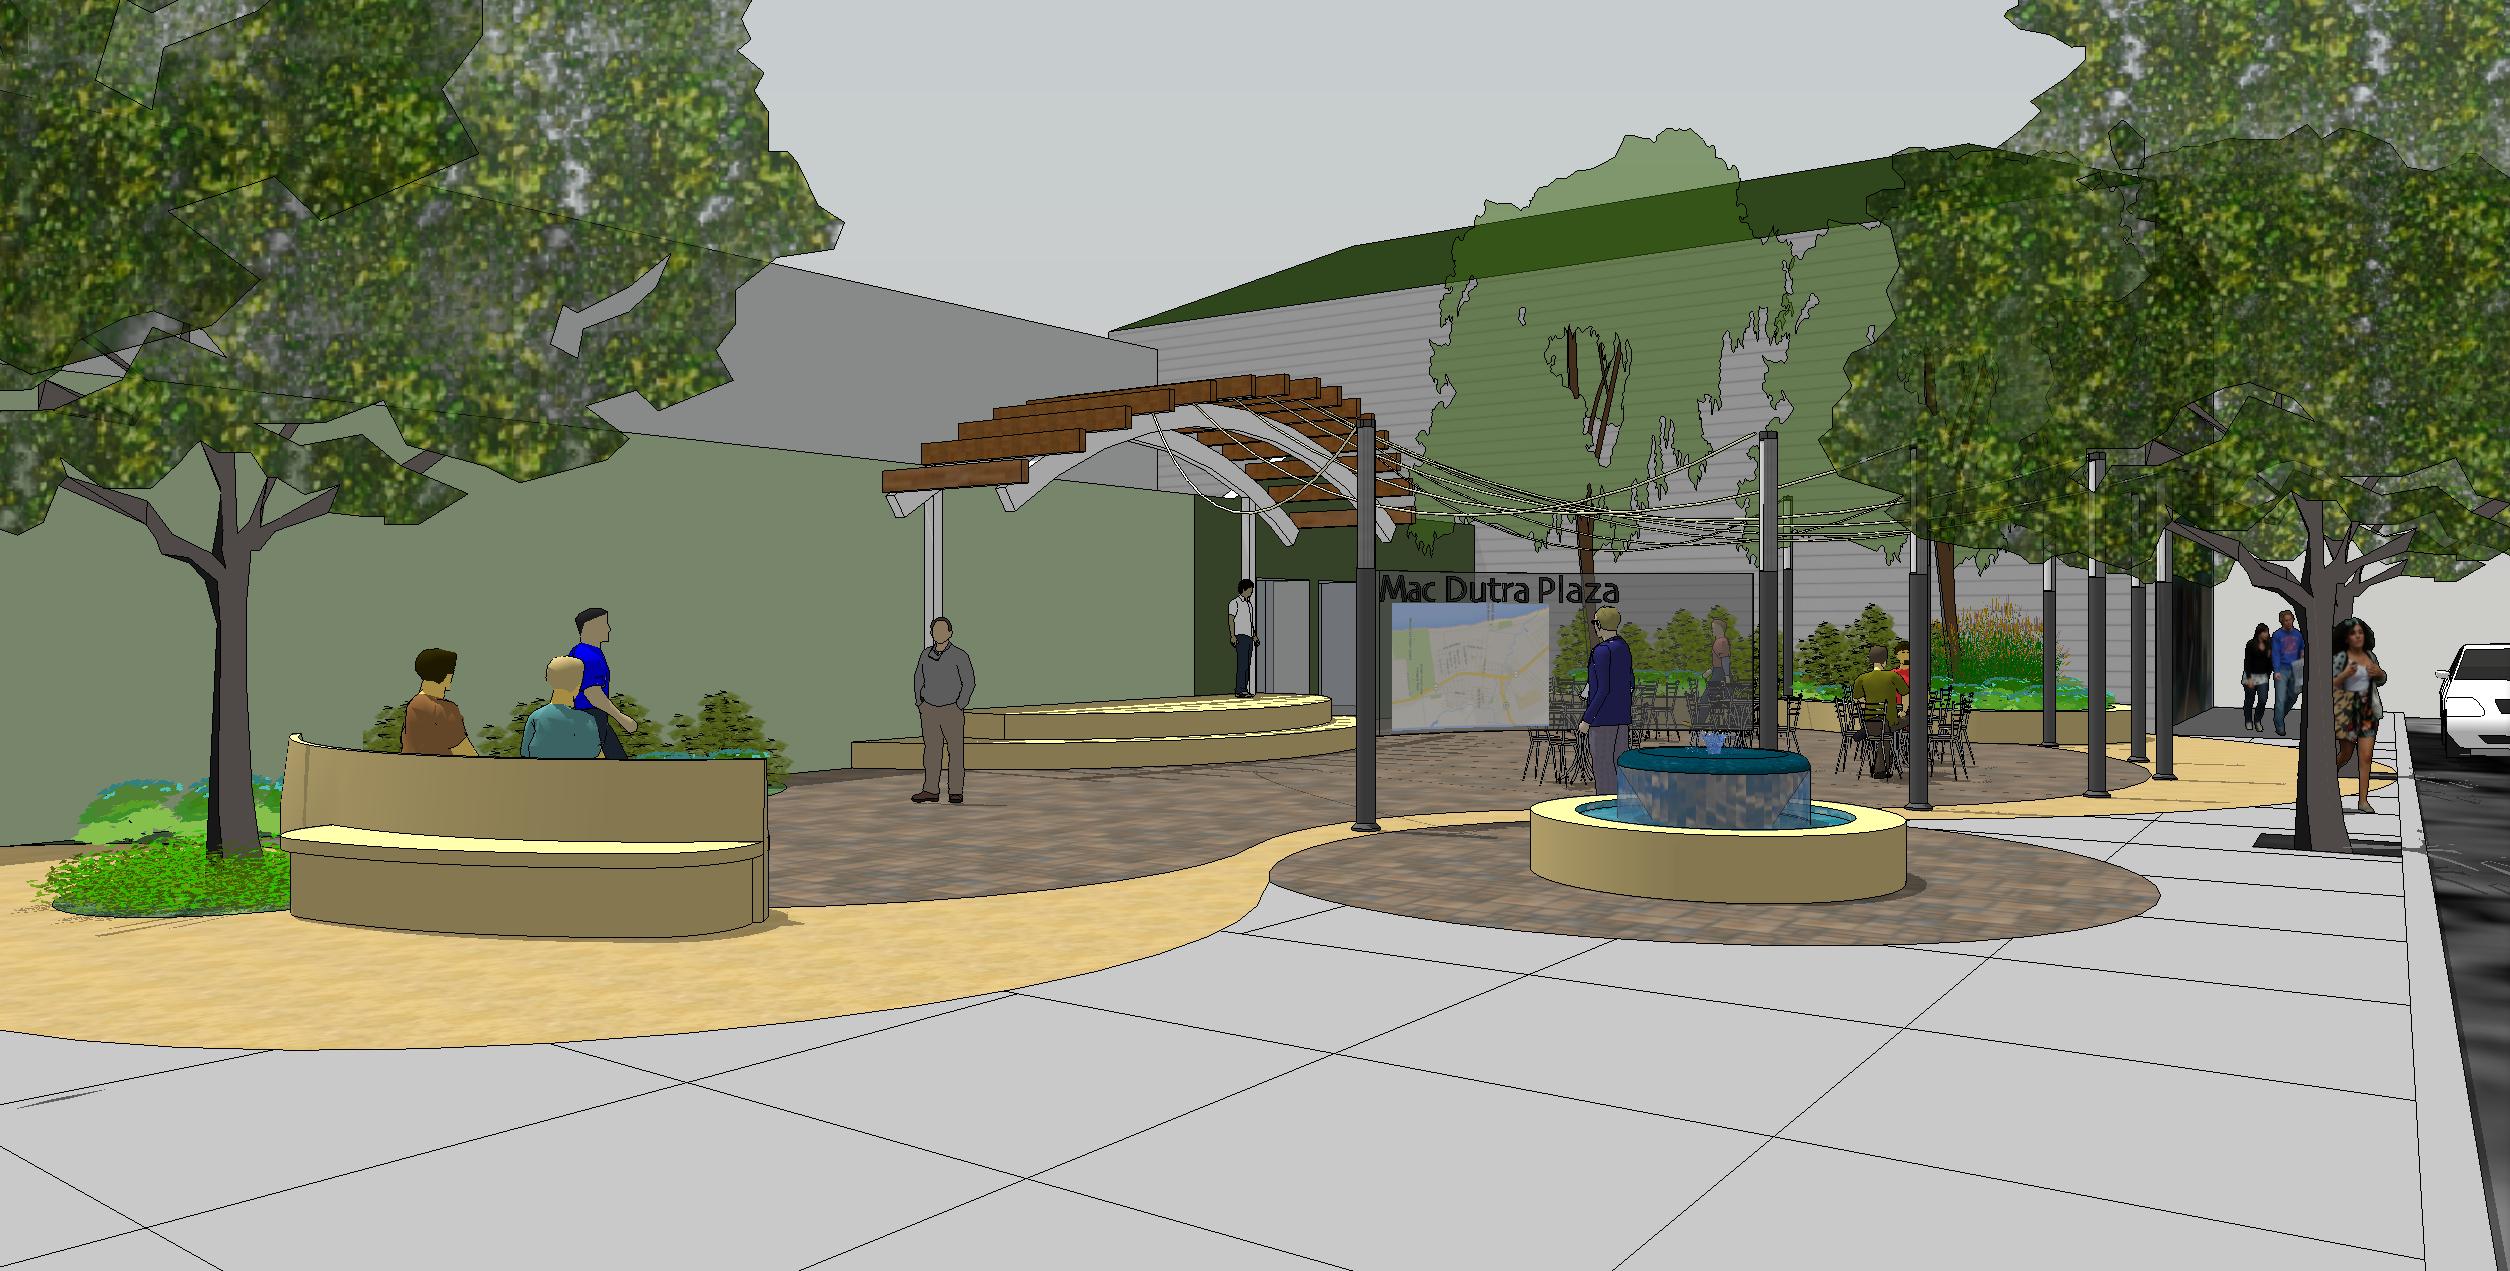 Very MacDutra Plaza - Half Moon Bay, CA - Kikuchi + Kankel Design Group FU28